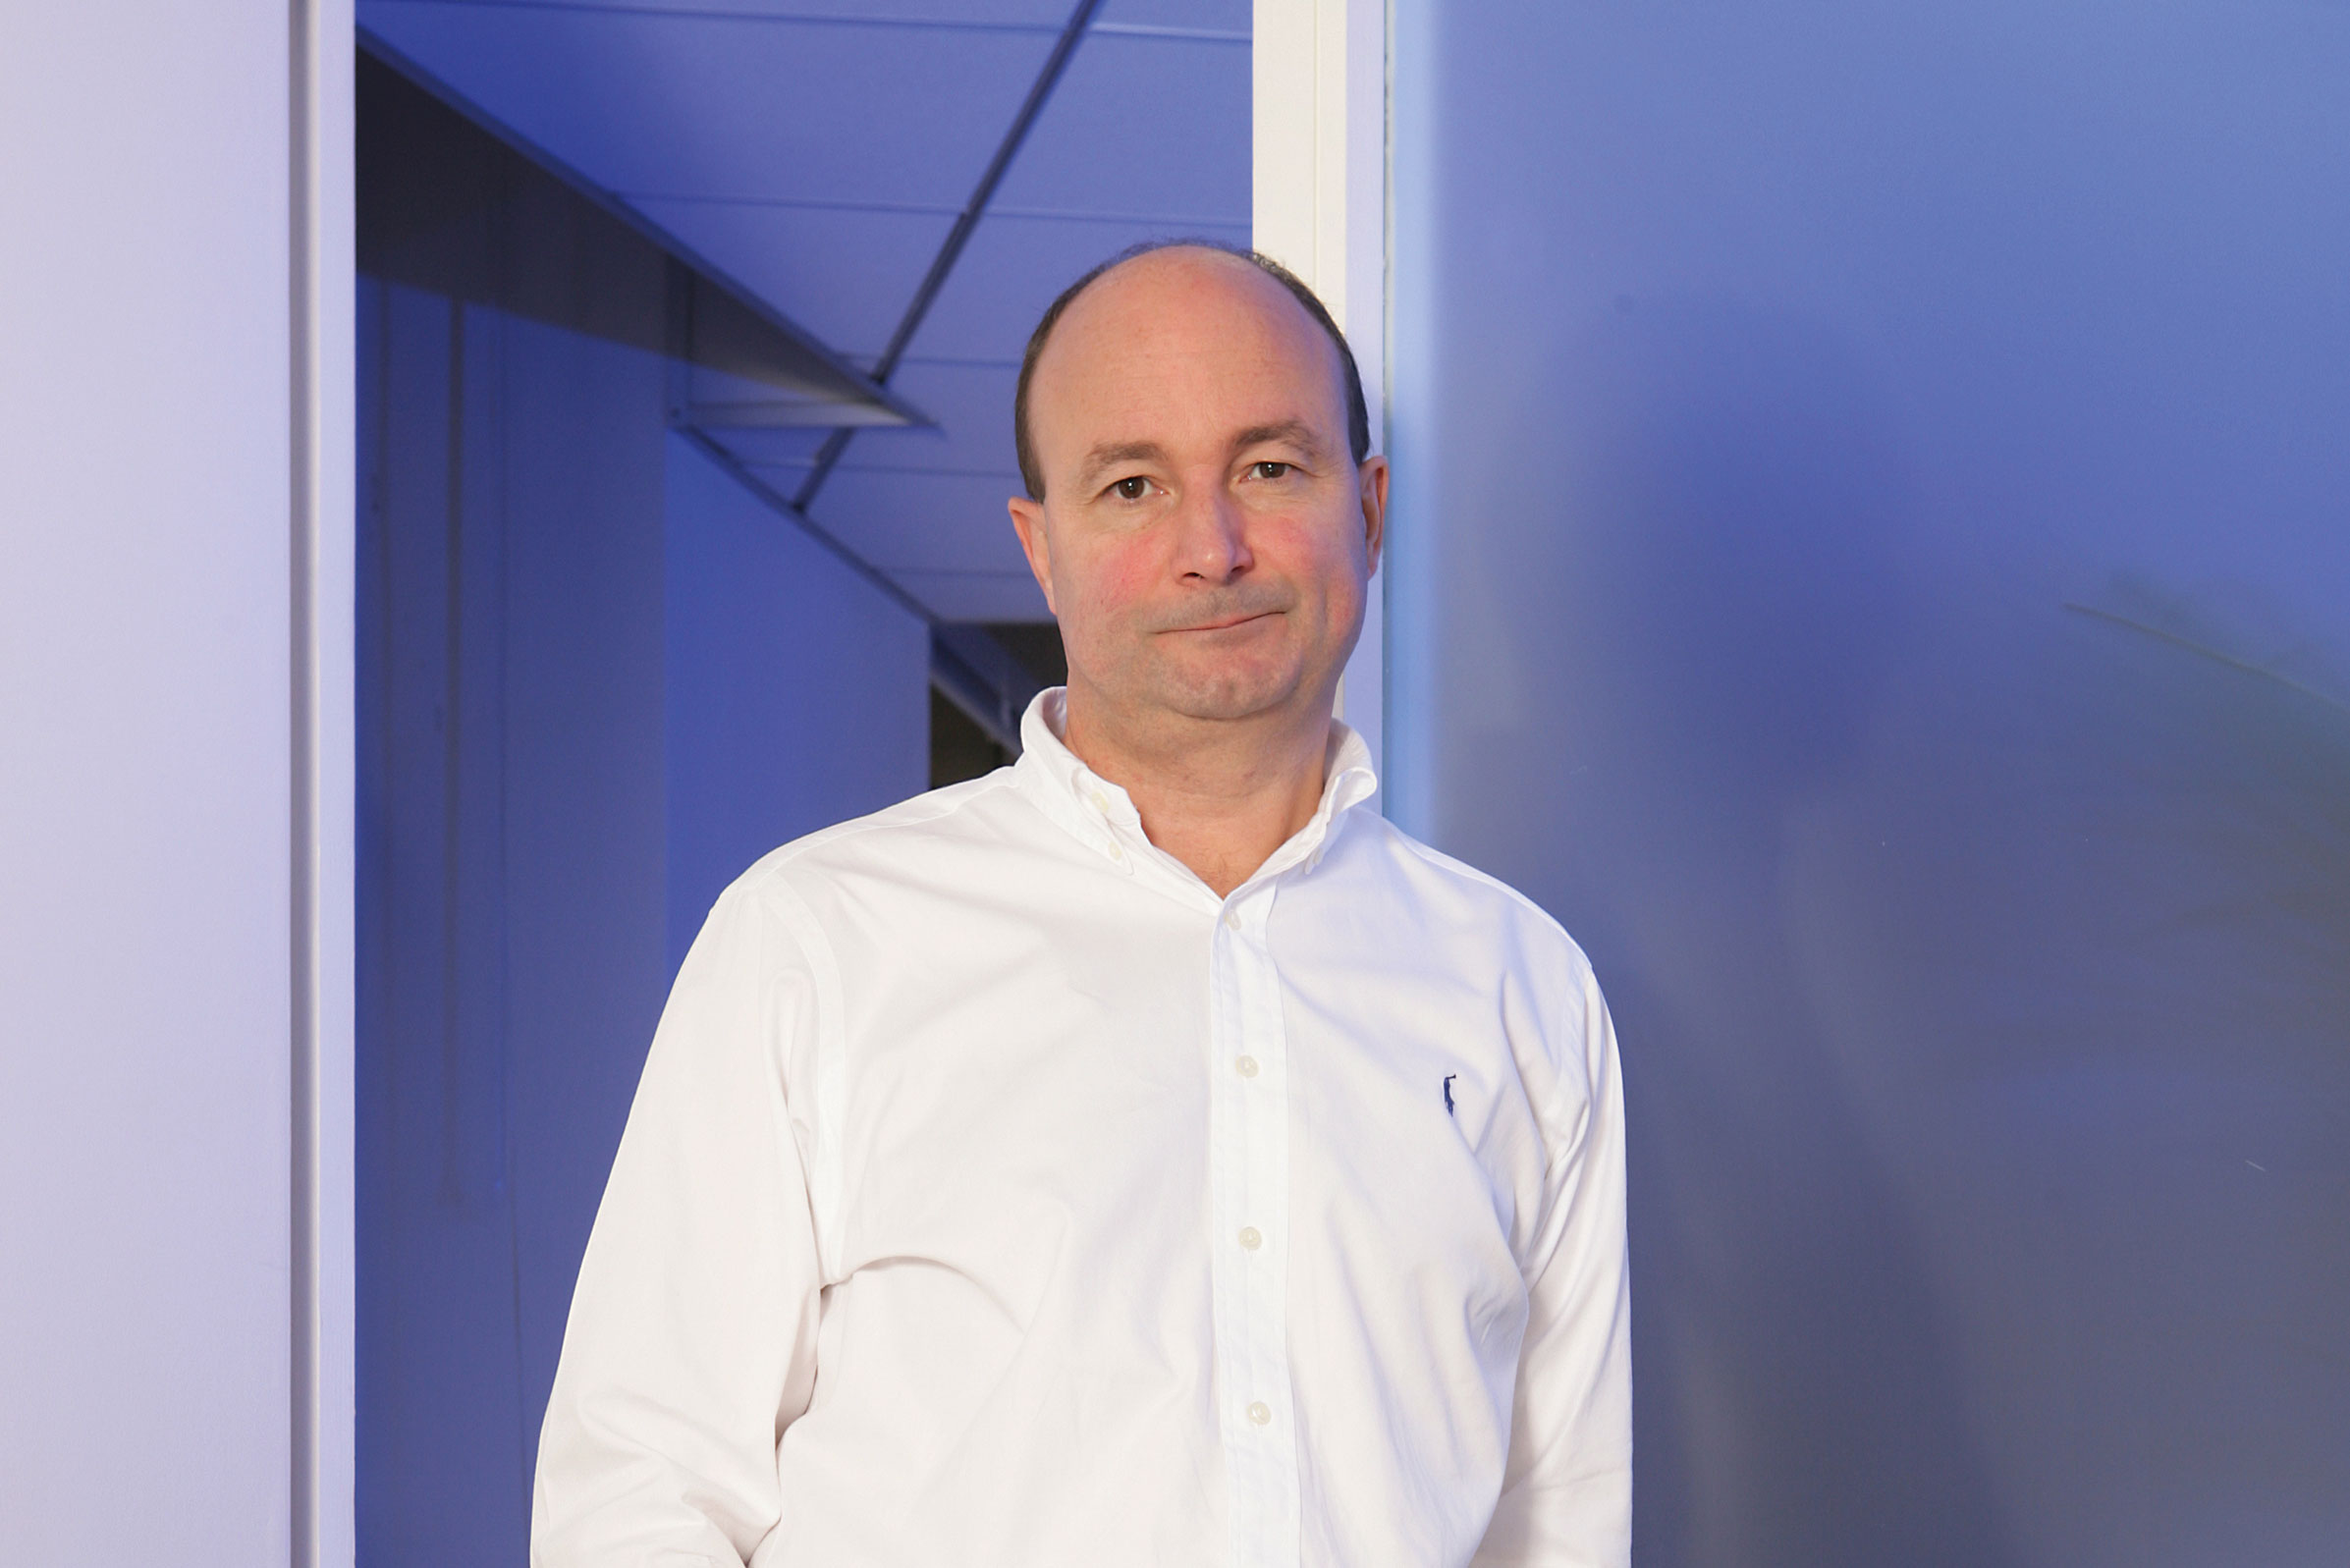 2. John Overend, managing director, Opera Media